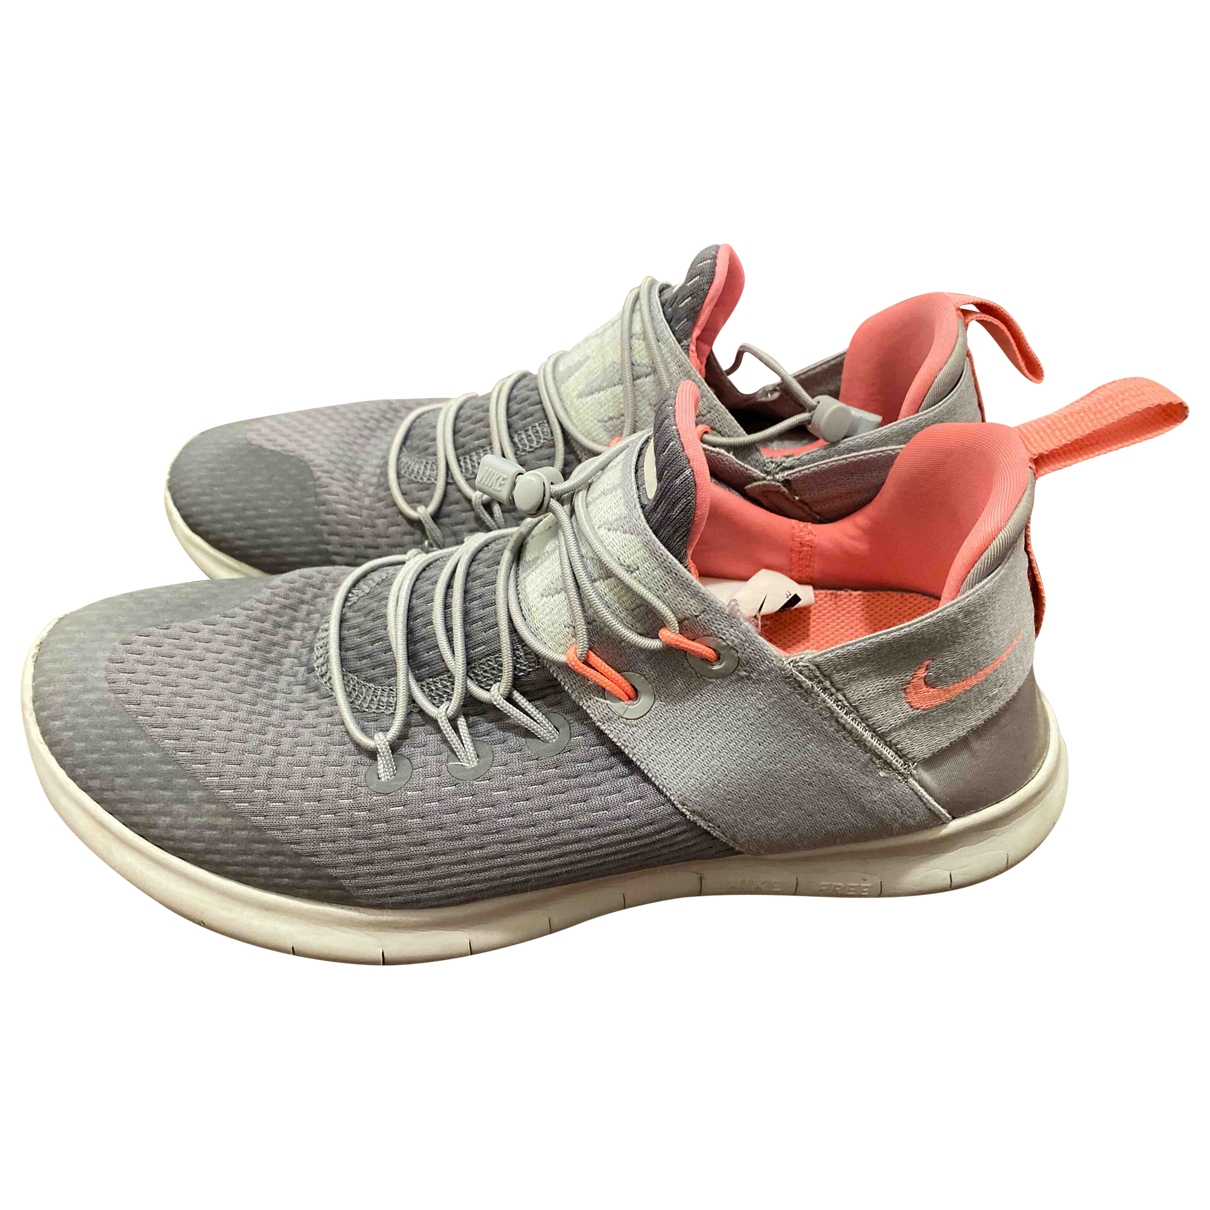 Nike - Baskets Free Run pour femme - gris